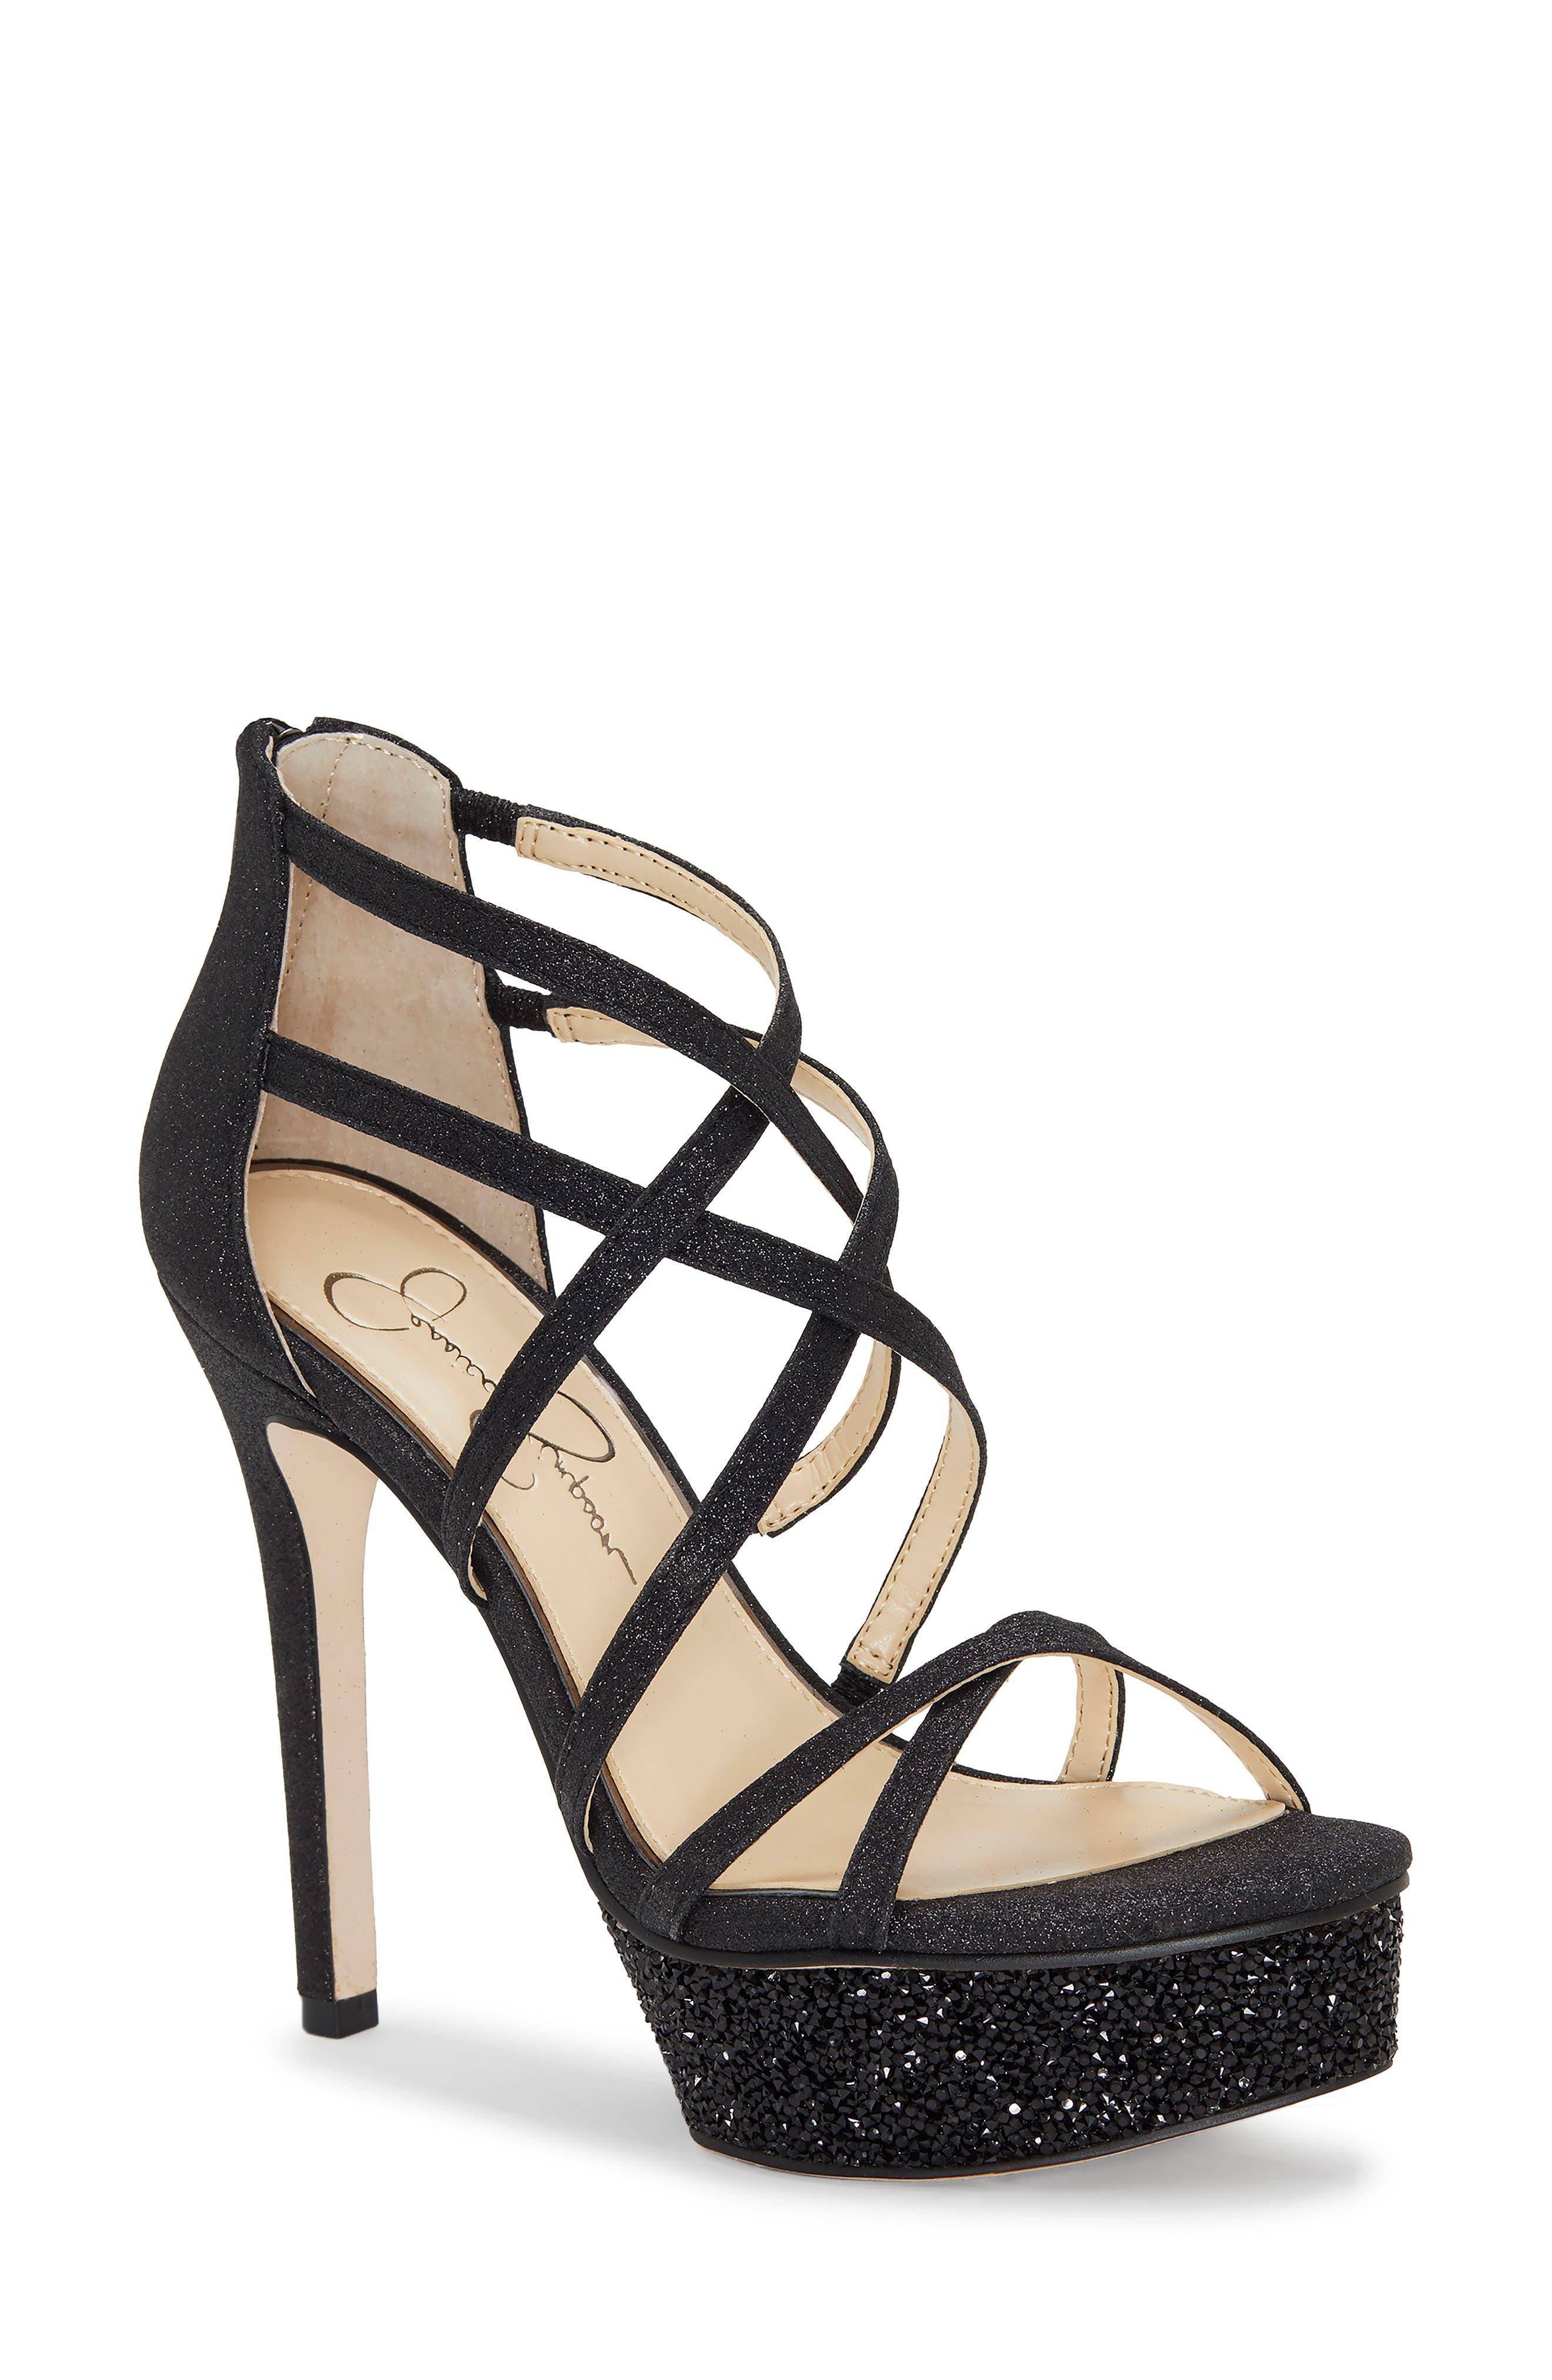 70d5b651538 Jessica Simpson Araya 2 Platform Sandal